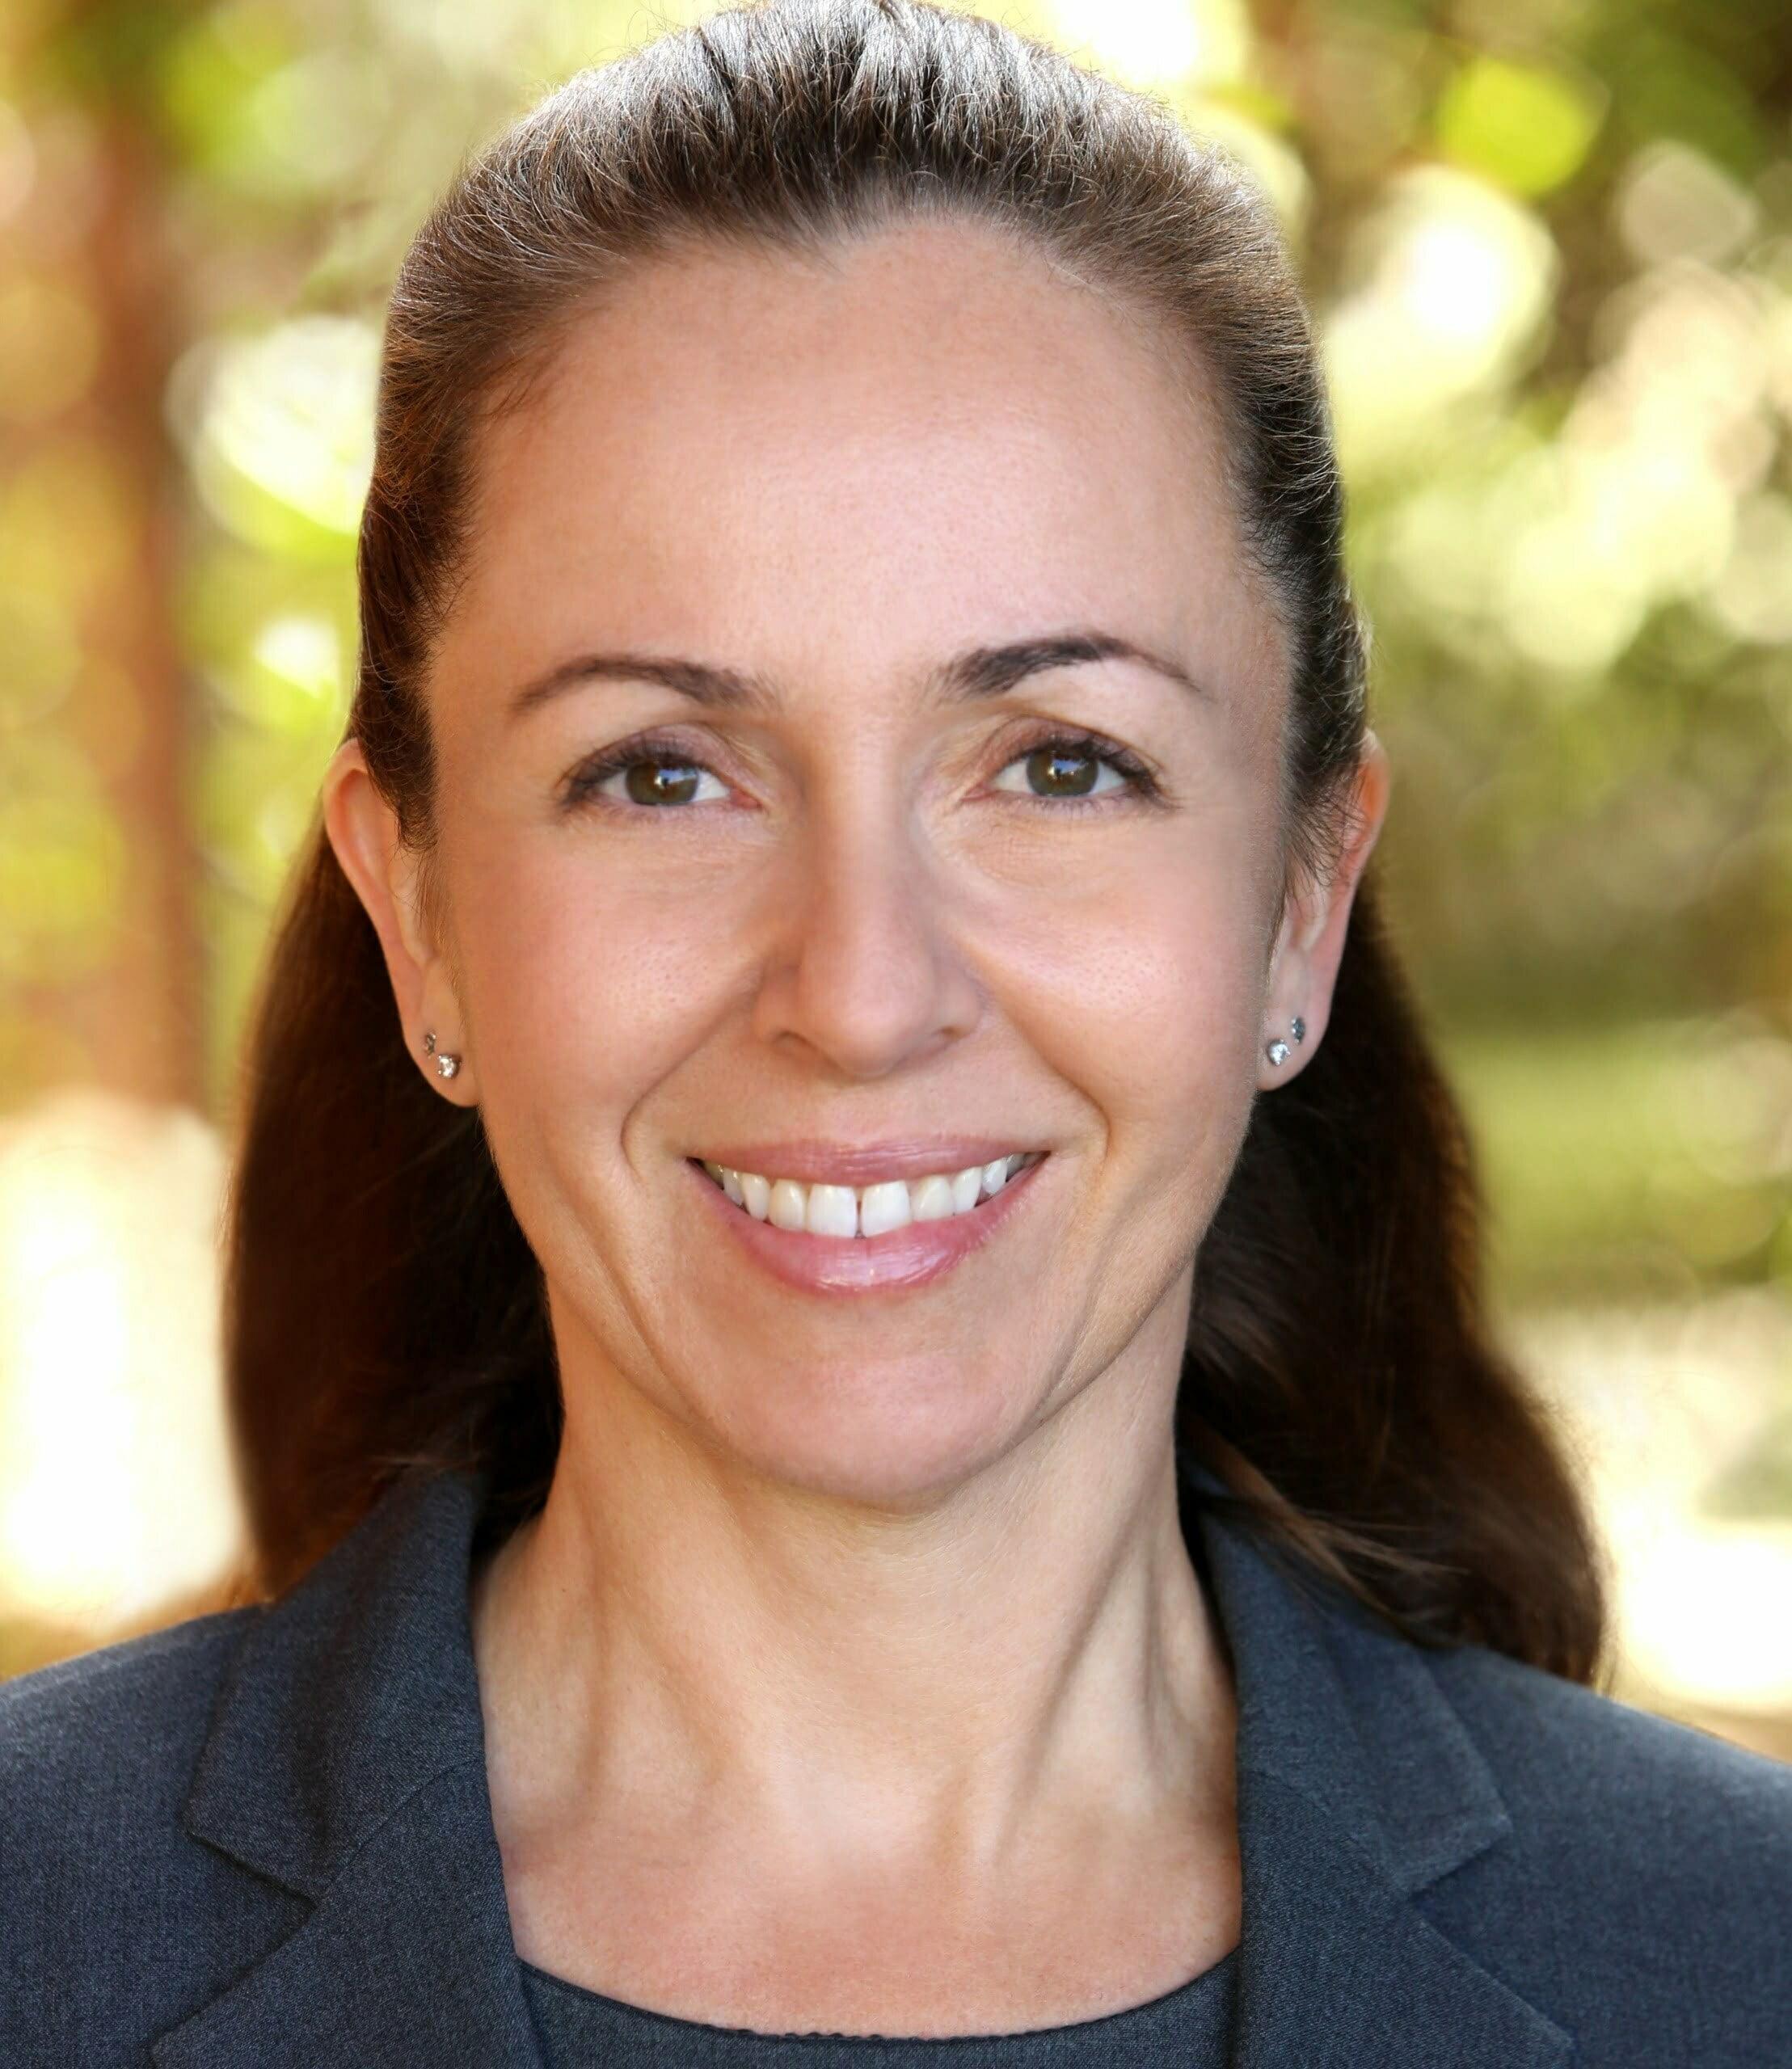 Anna Papazian